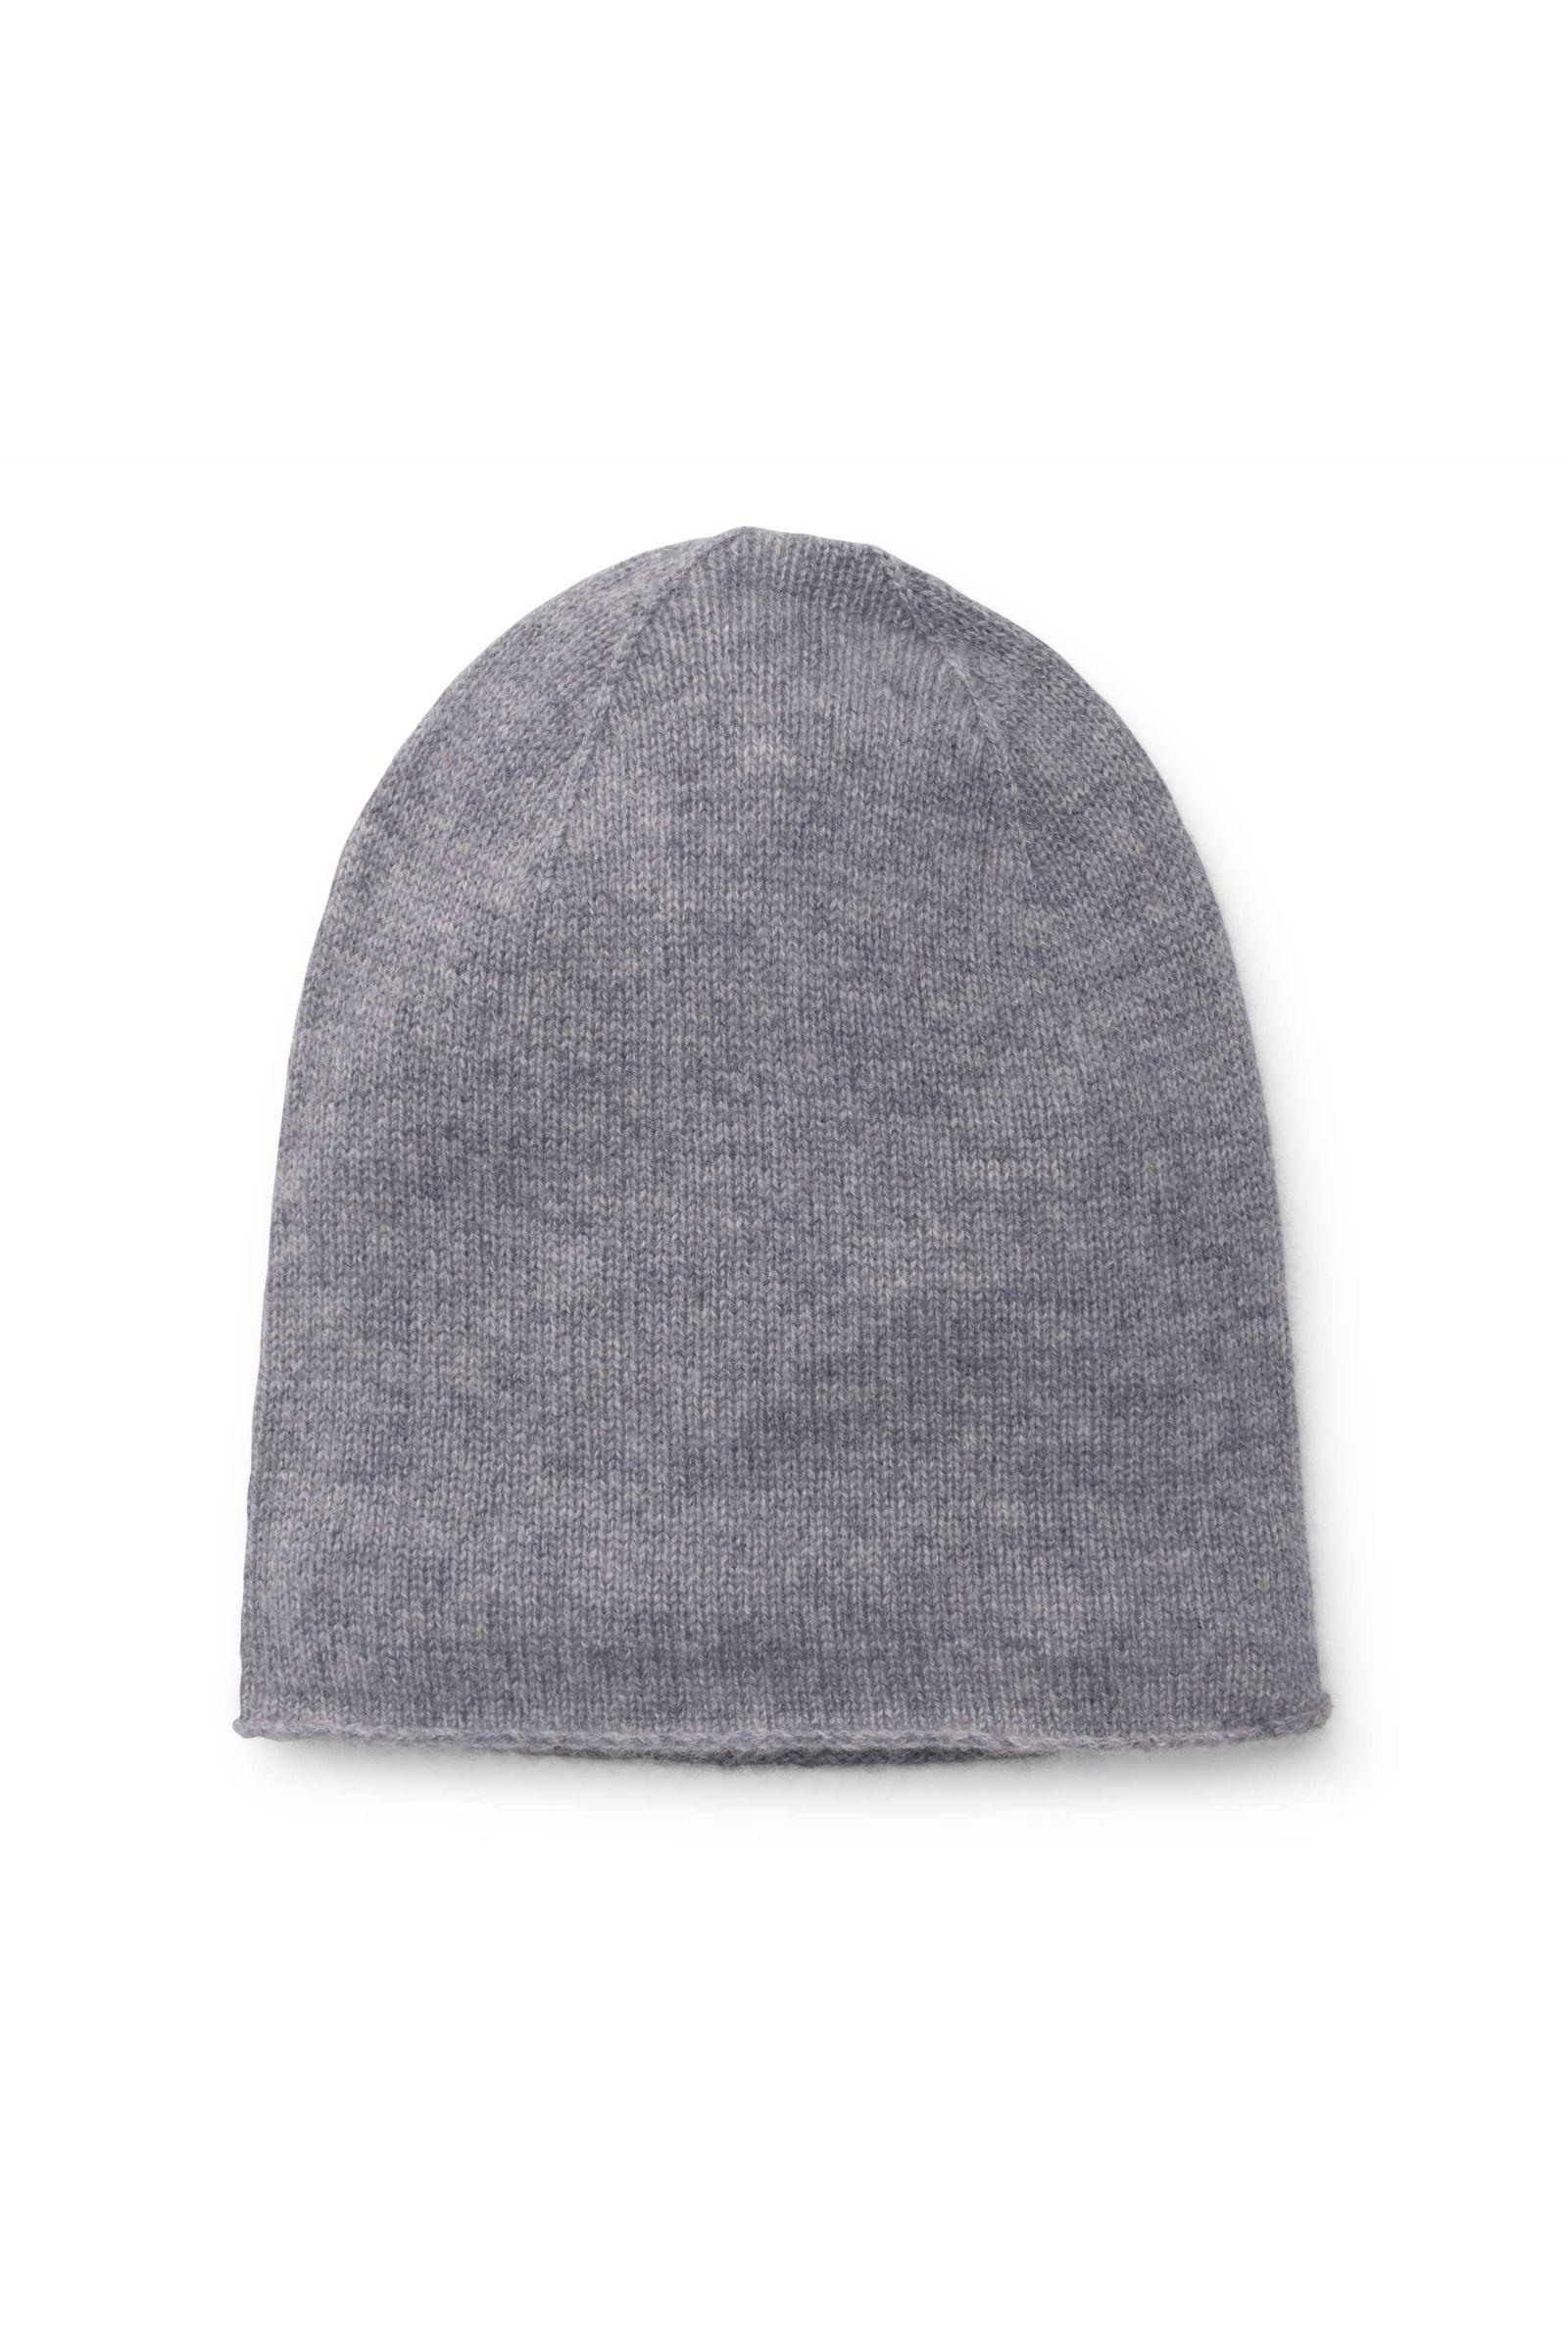 Kinder Cashmere Mütze grau